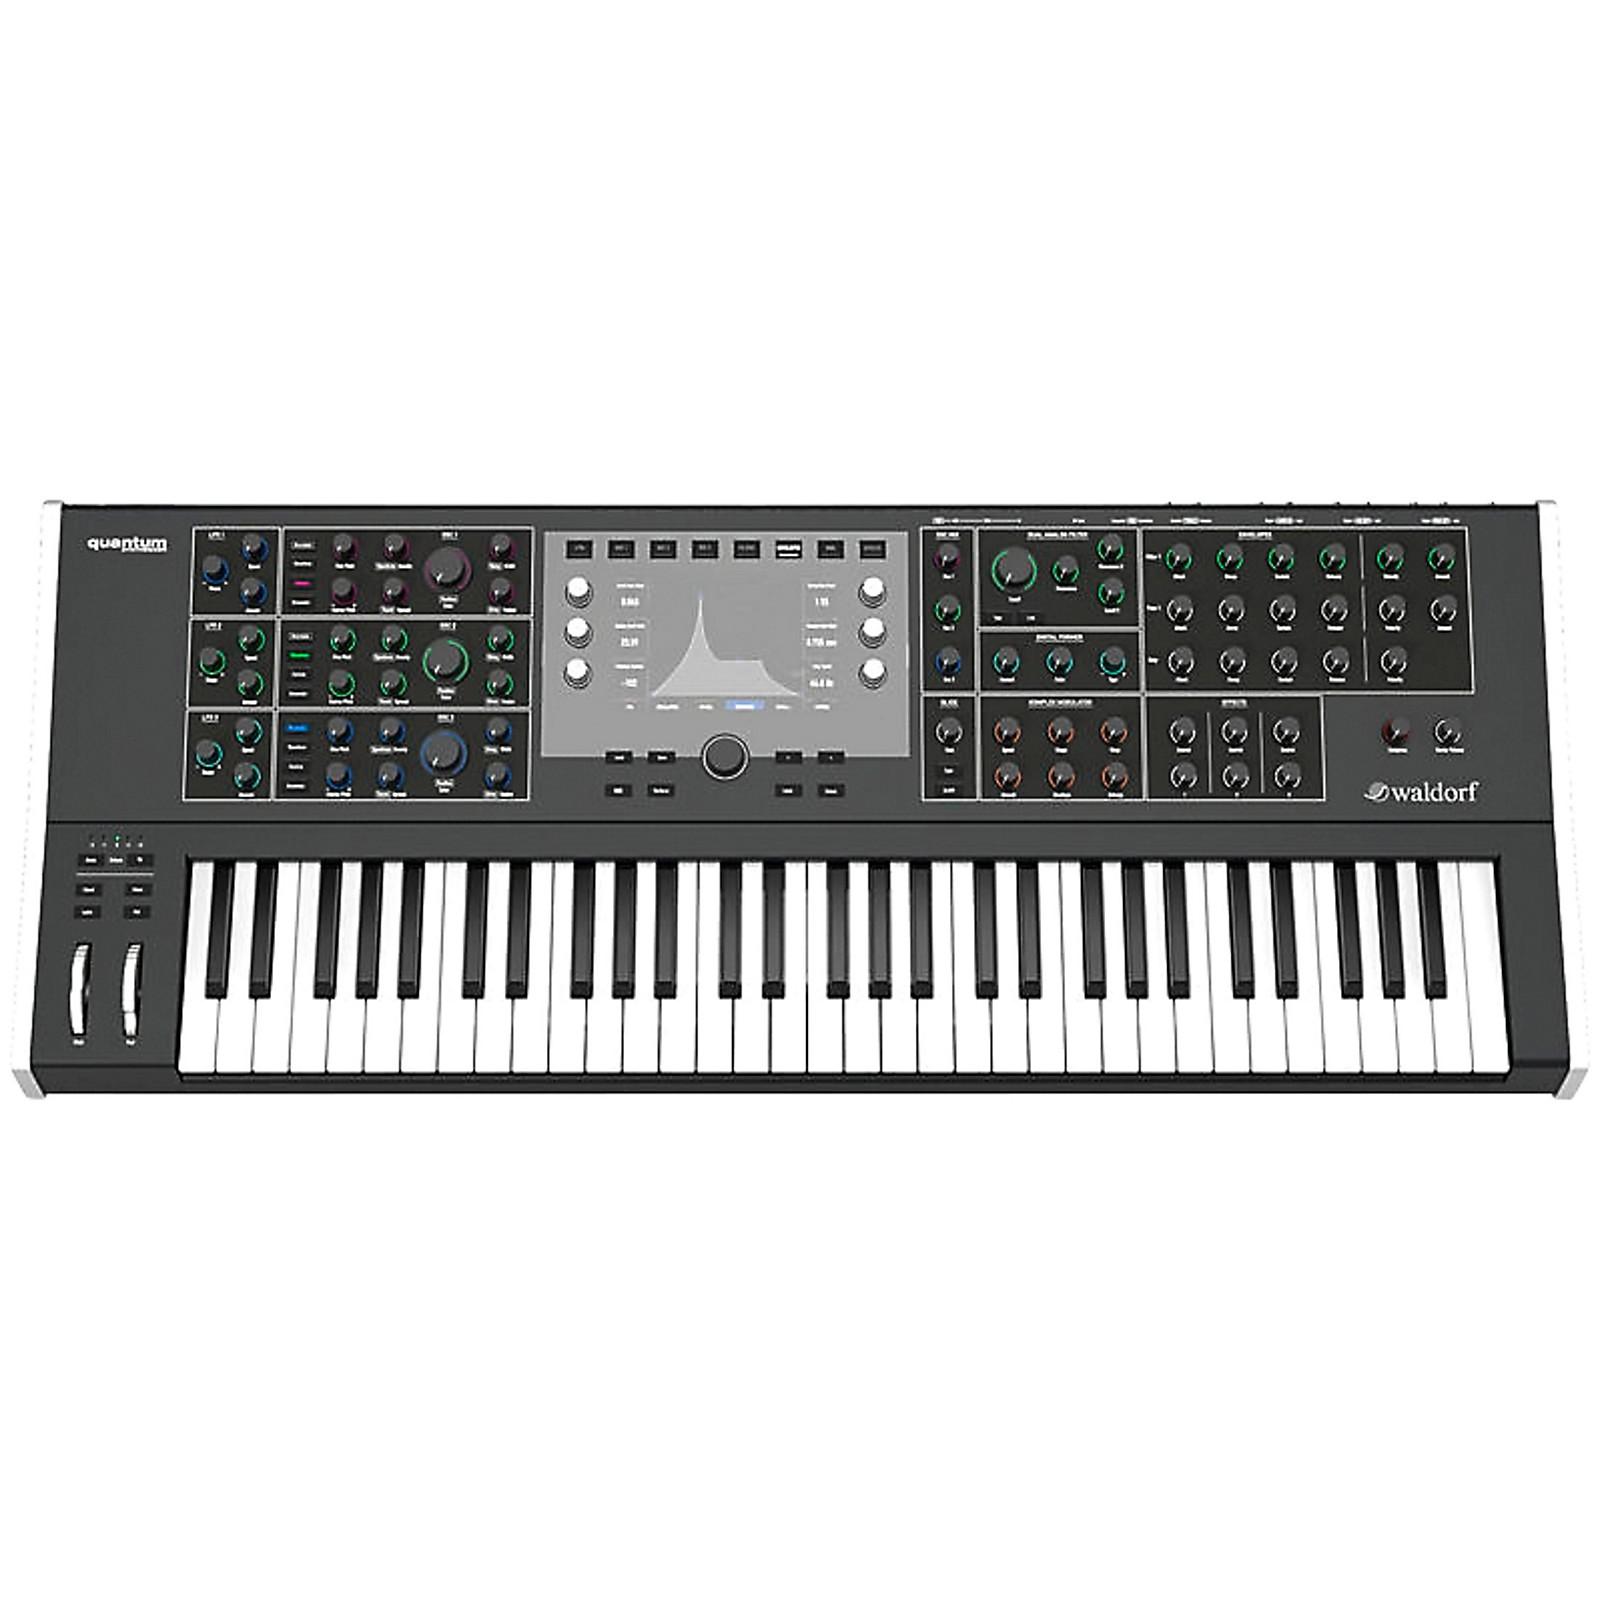 Waldorf Quantum Digital/Analog Hybrid Synthesizer